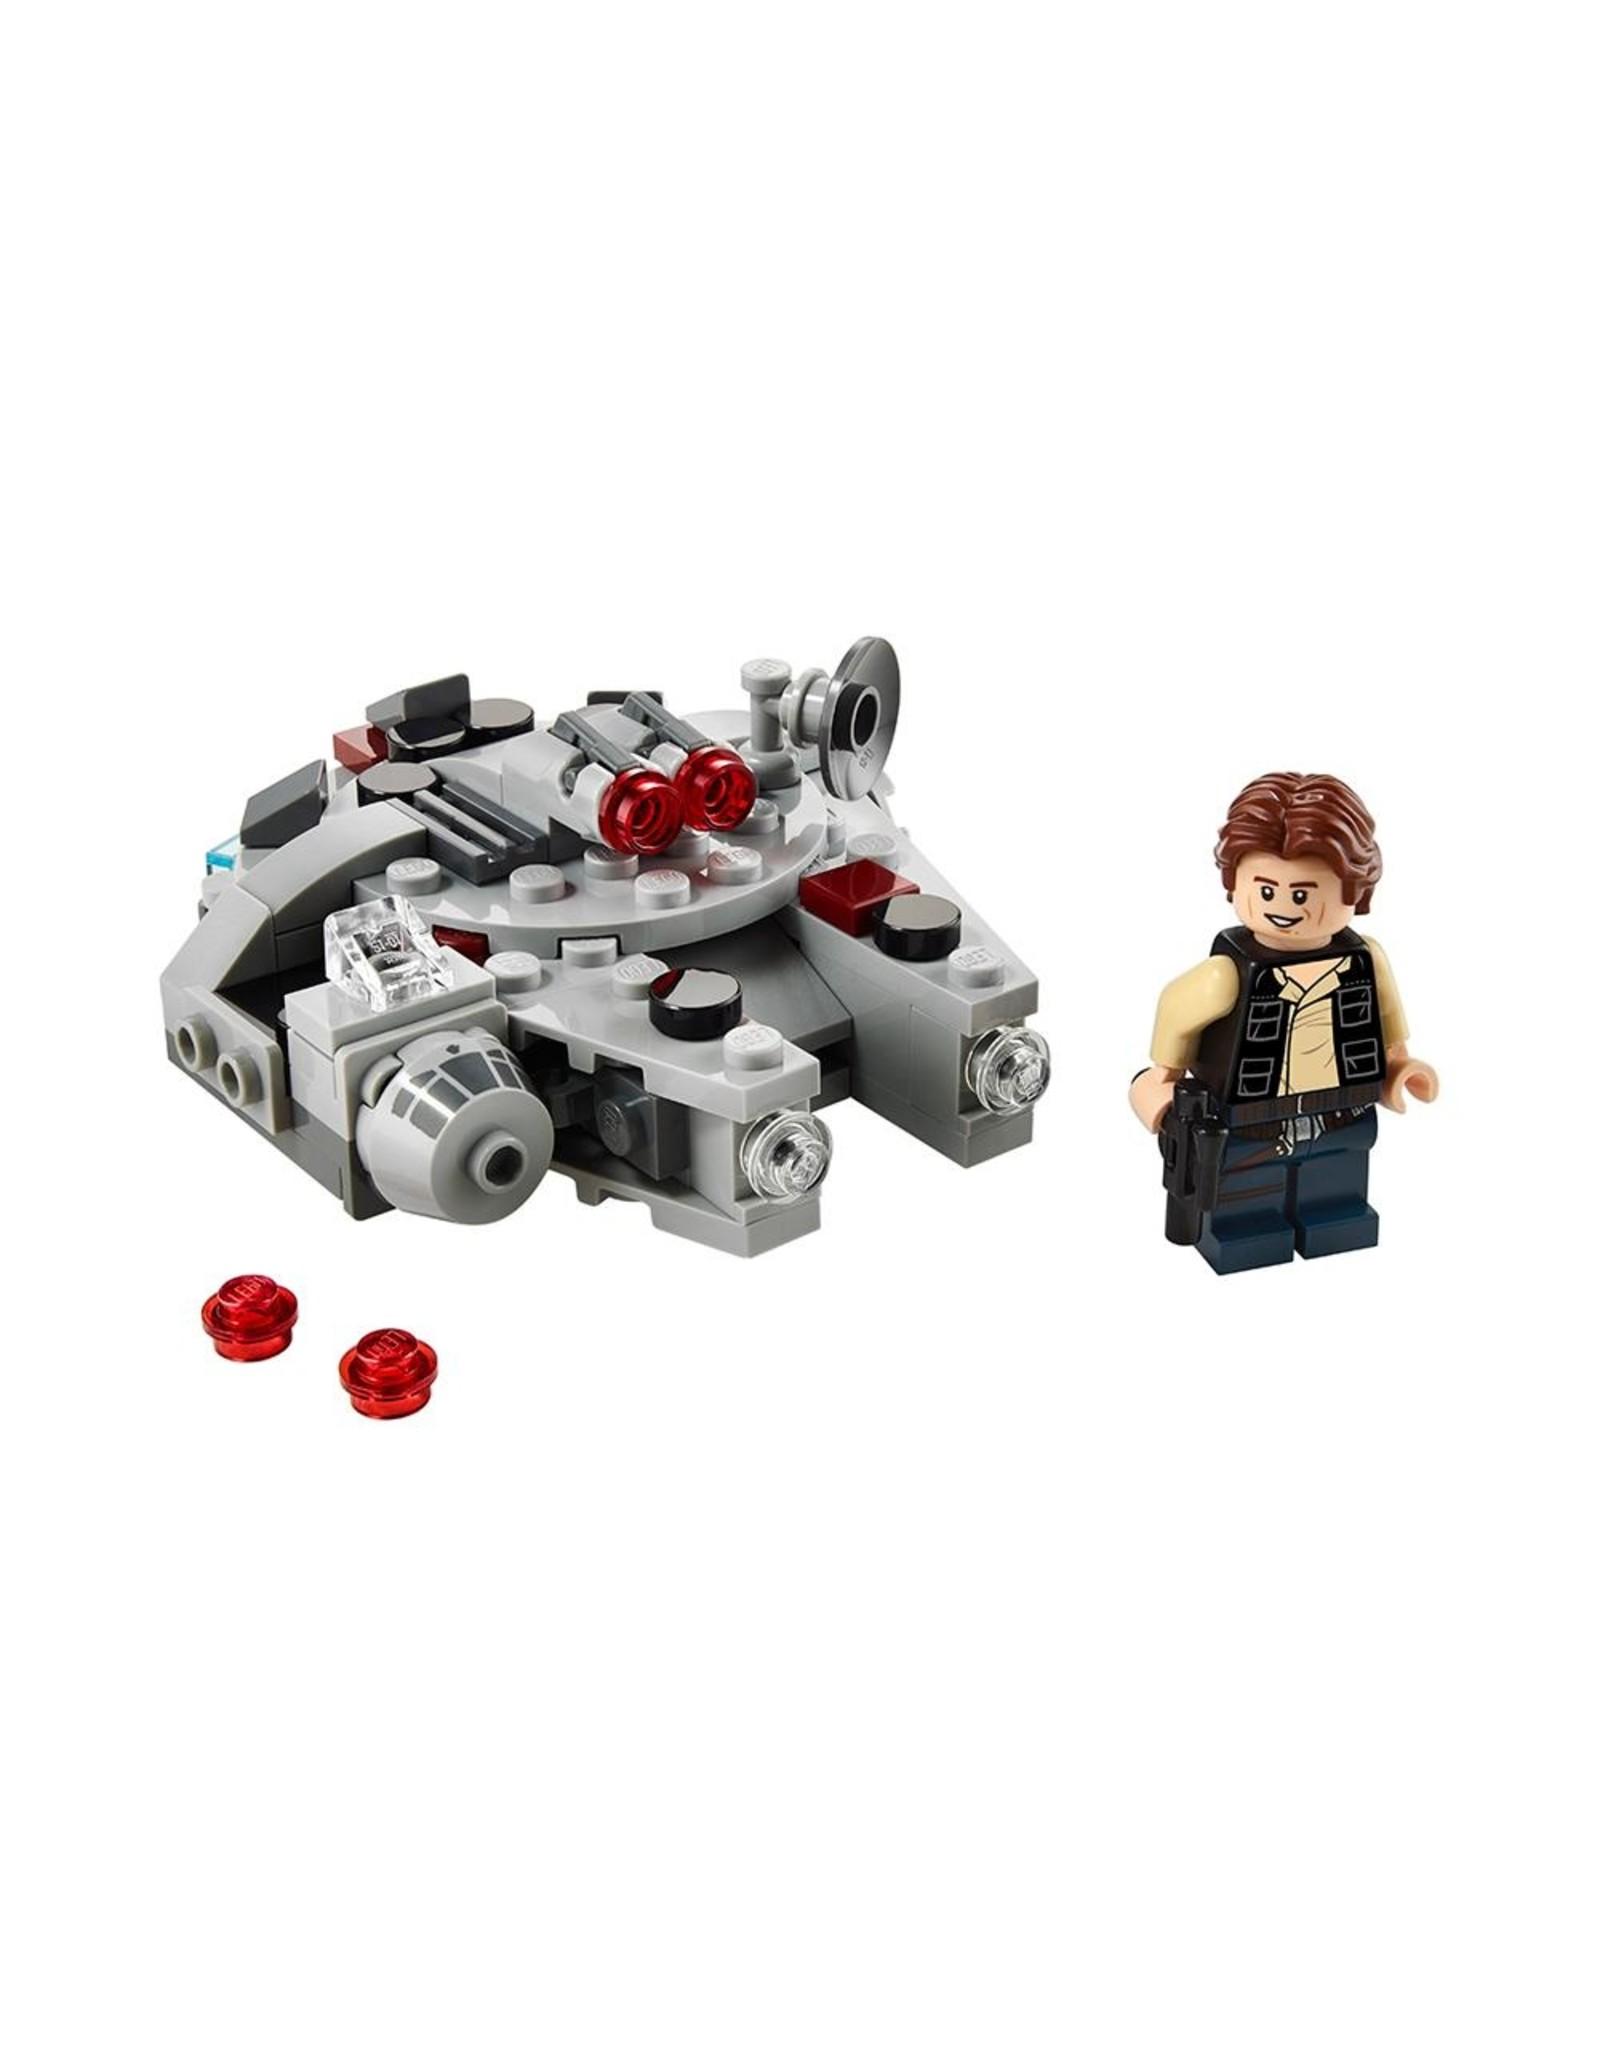 LEGO Star Wars 75295 Millennium Falcon Microfighter Series 8